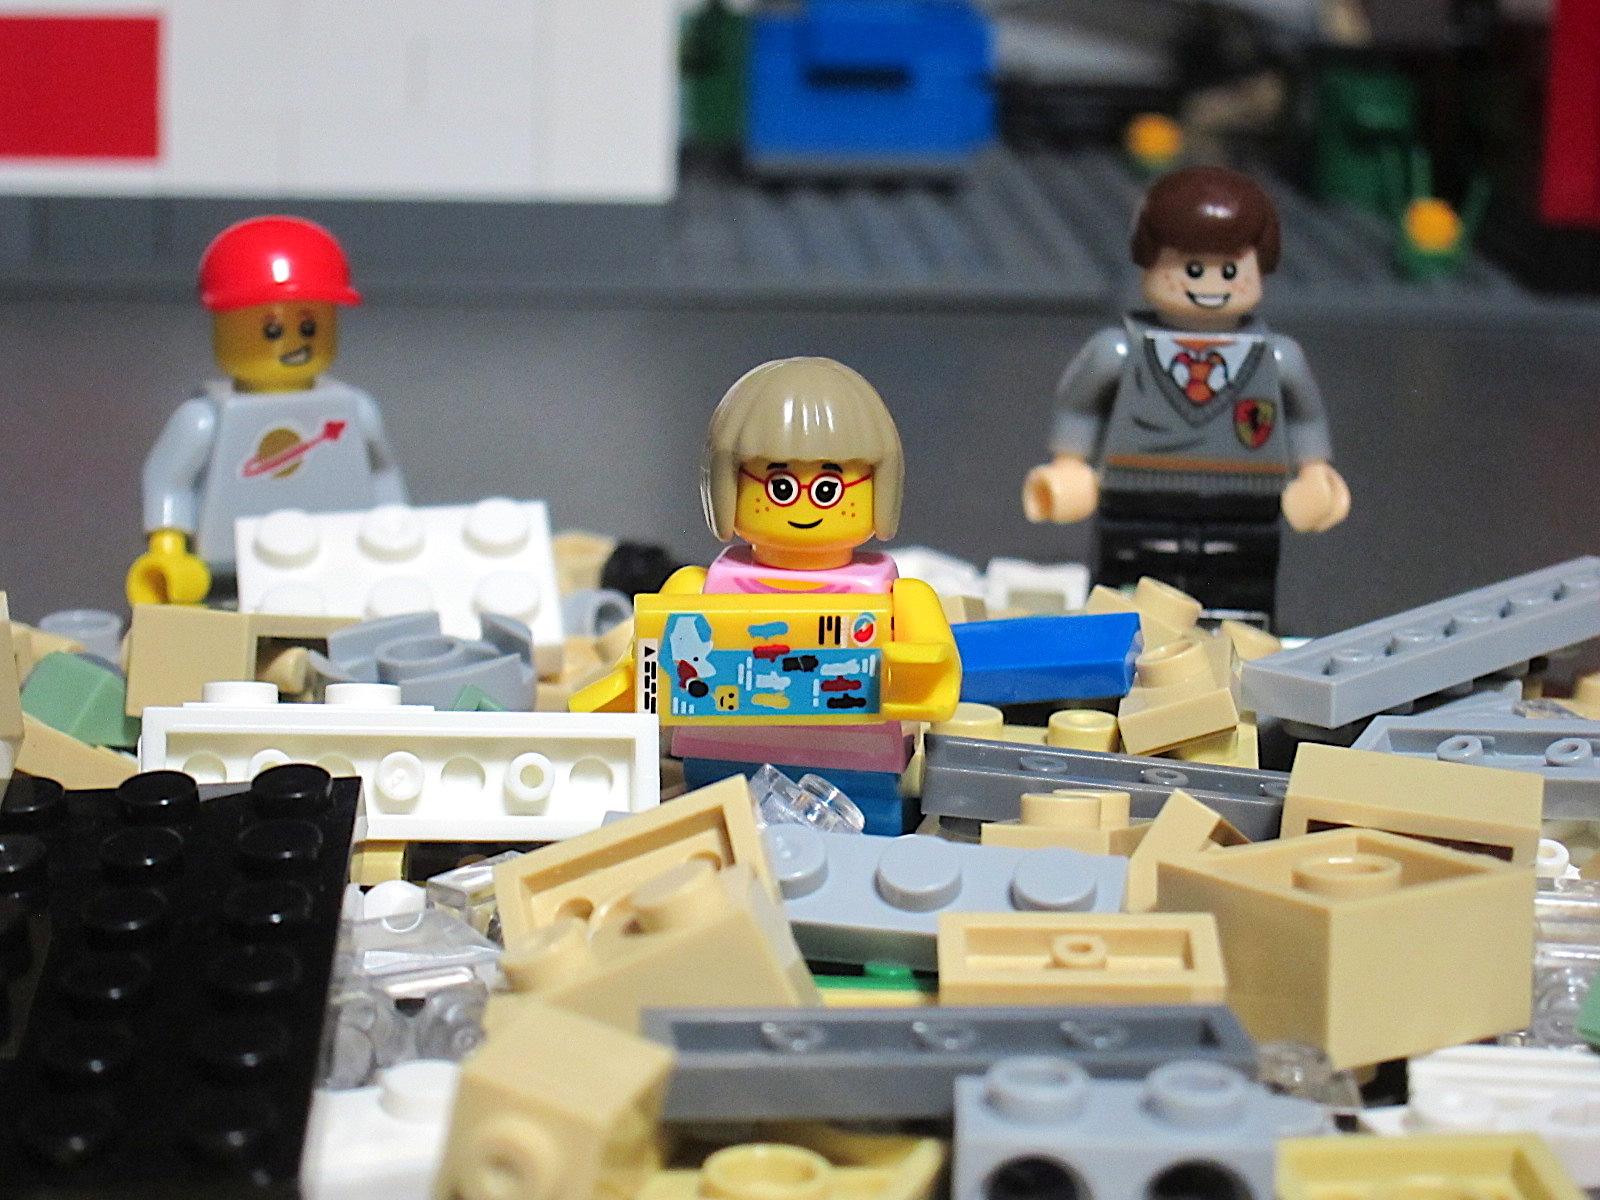 It's Not Lego!: Decool 1104 Mini Town Hall Building Block Set